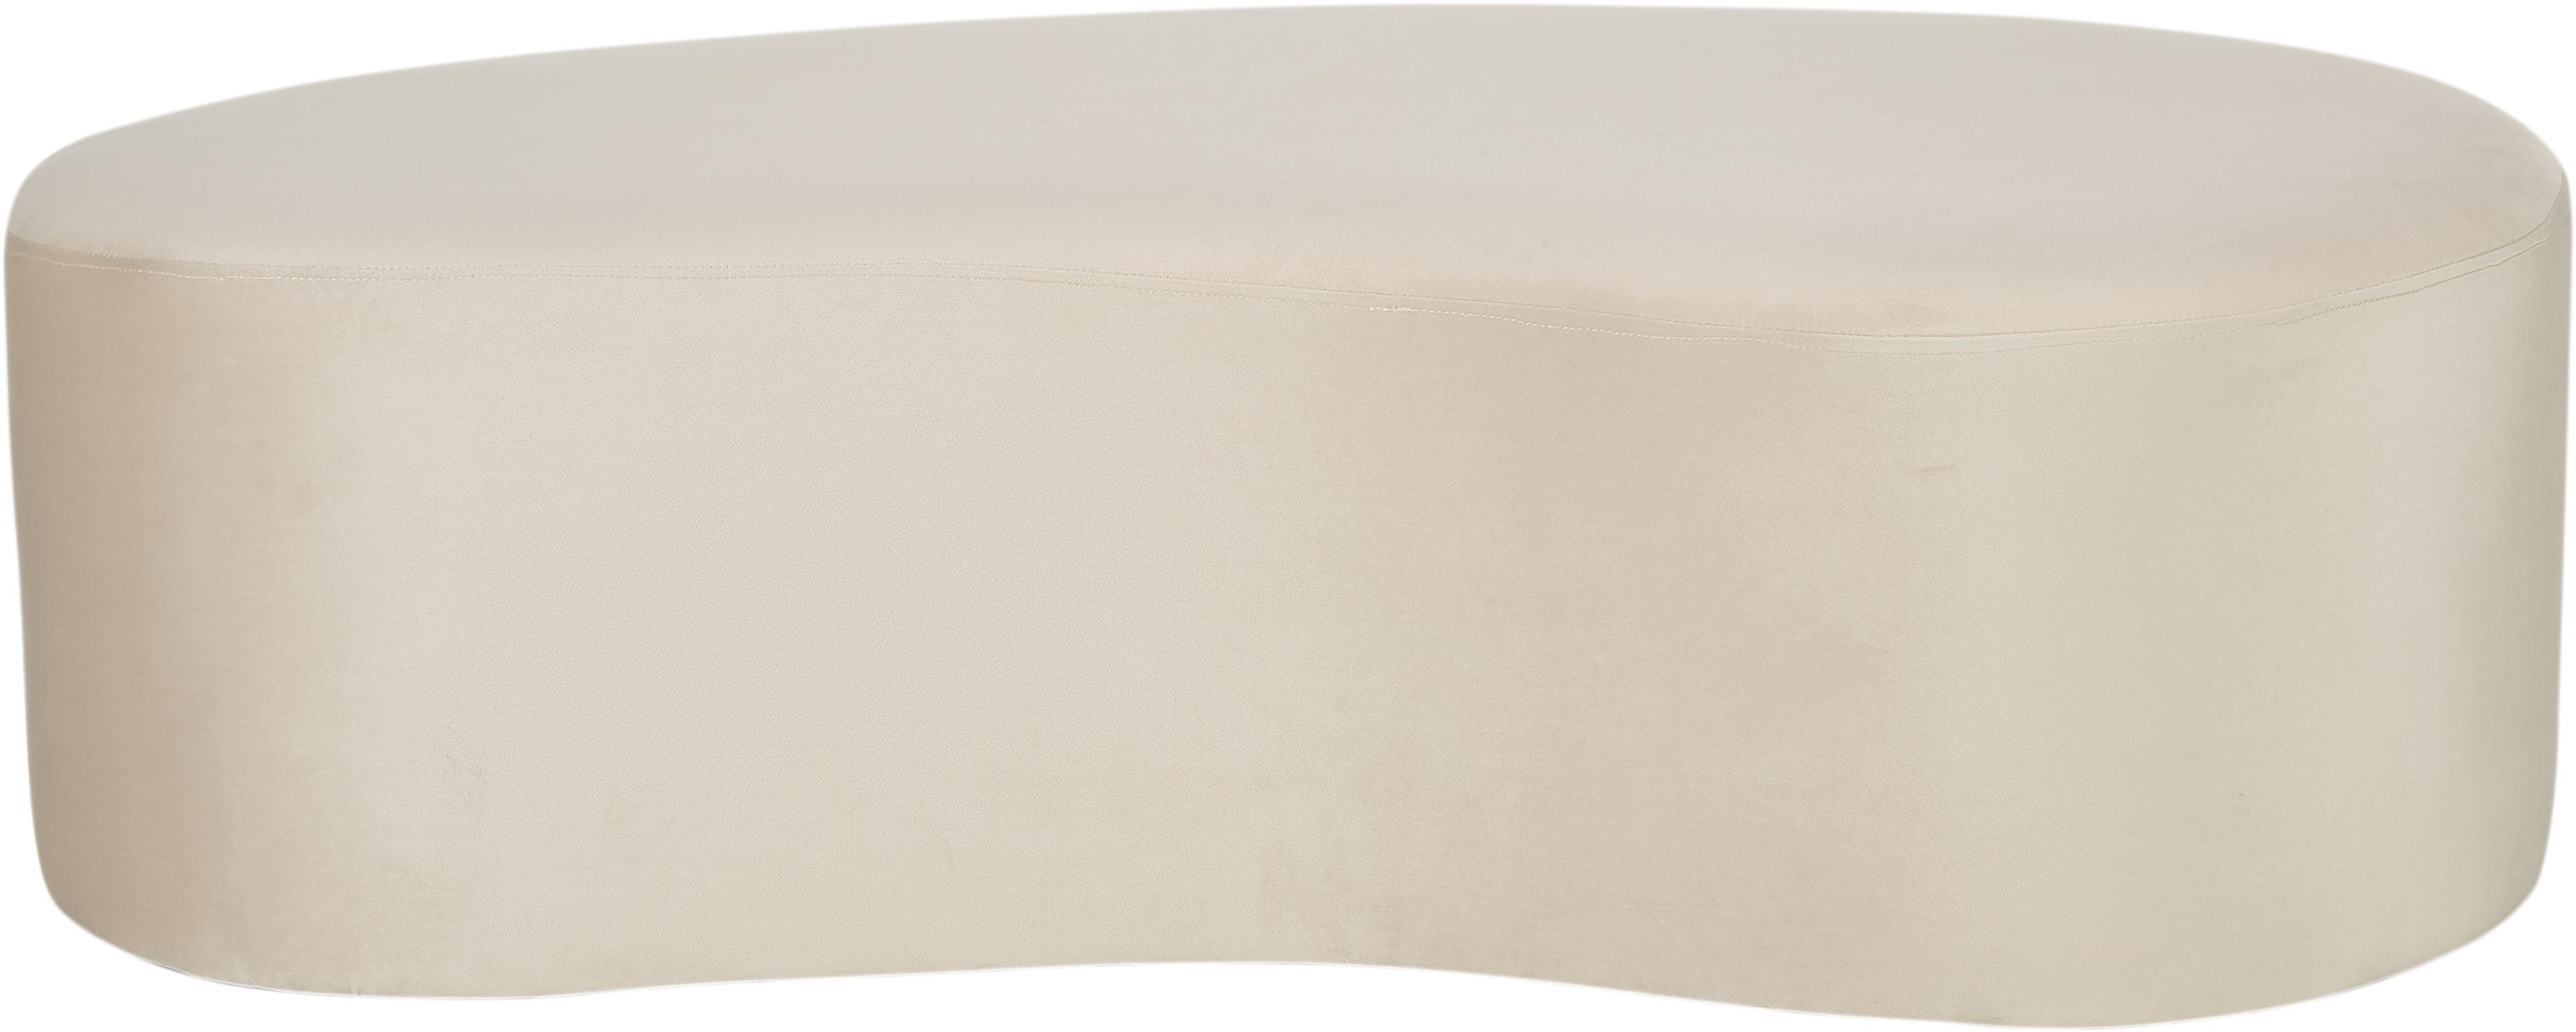 Poef Horta , Polyester, Gebroken wit, 60 x 36 cm